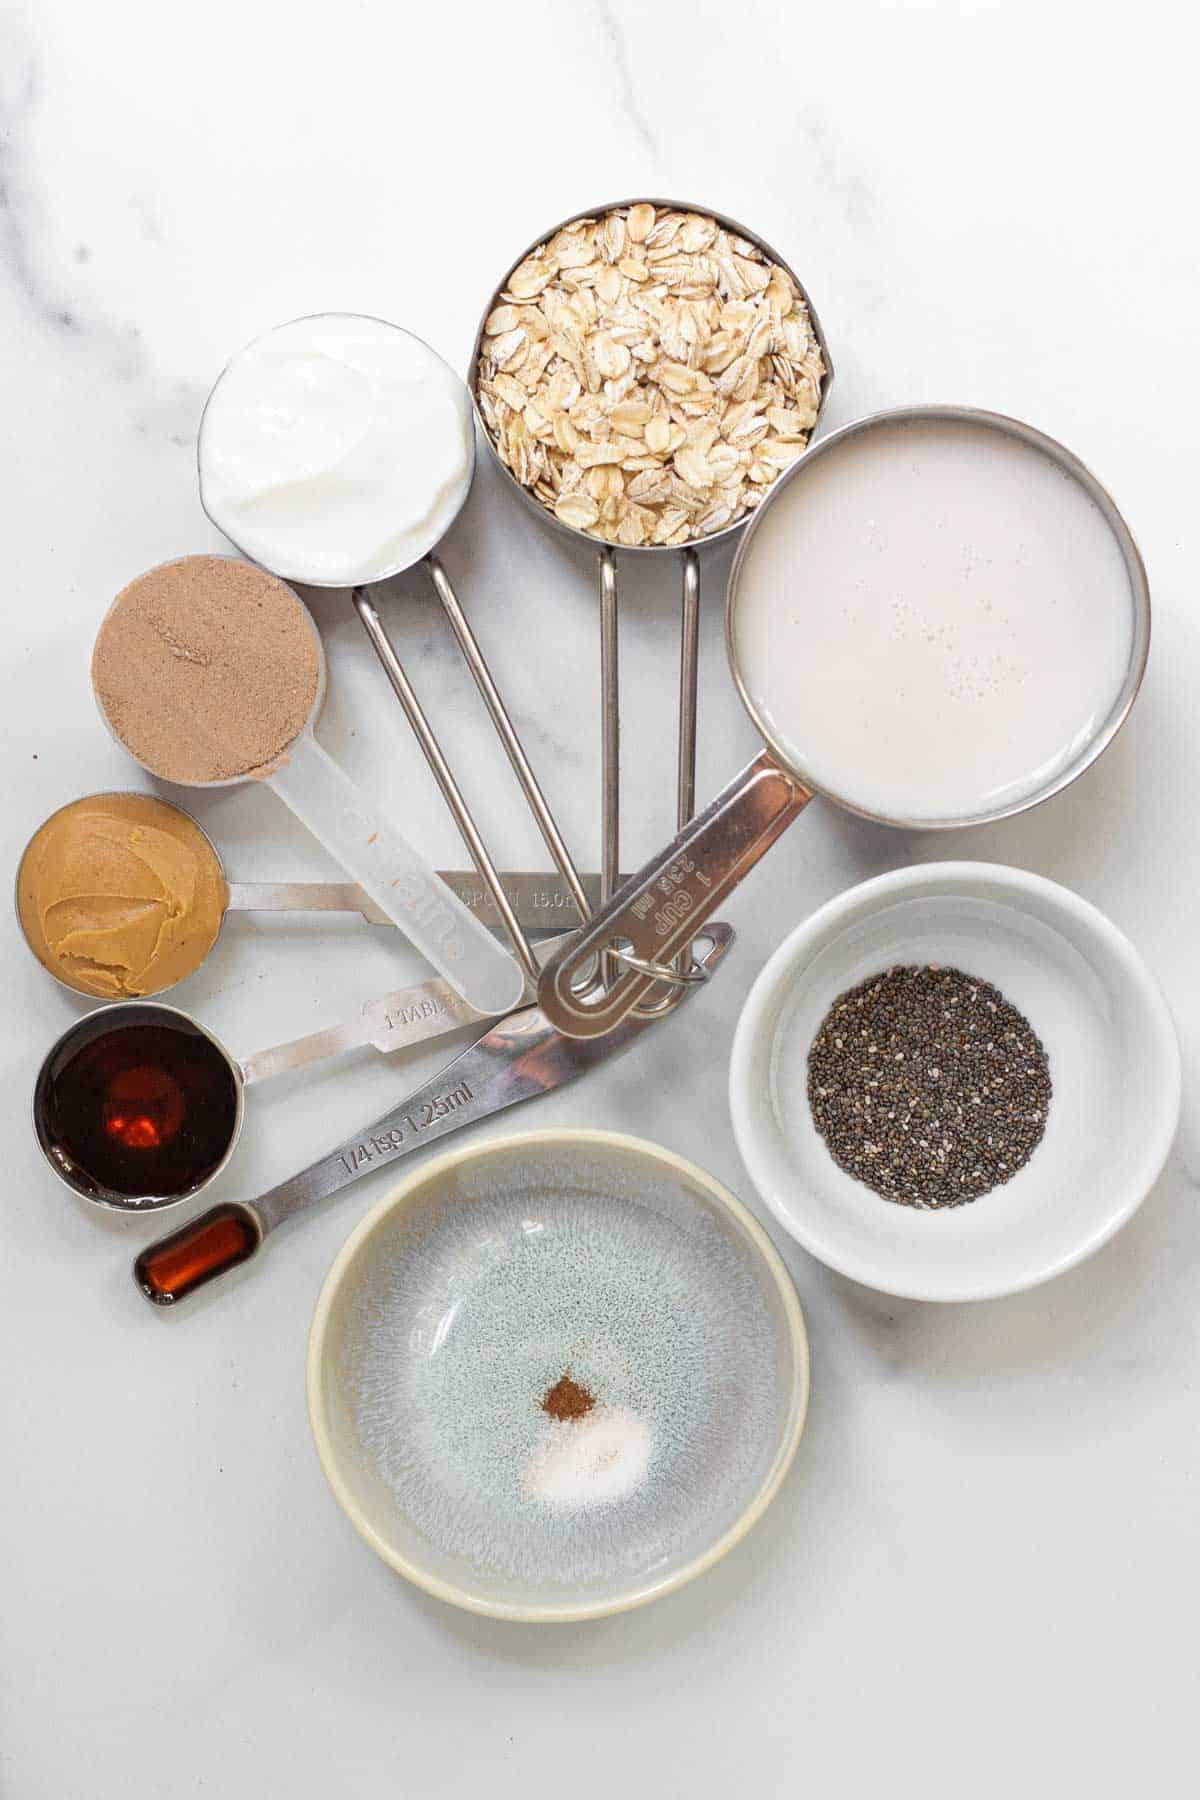 Protein Powder Overnight Oats ingredients: oatmeal, chocolate protein powder, almond milk, Greek yogurt, creamy peanut butter, maple syrup, chia seeds, vanilla extract, salt, and cinnamon.